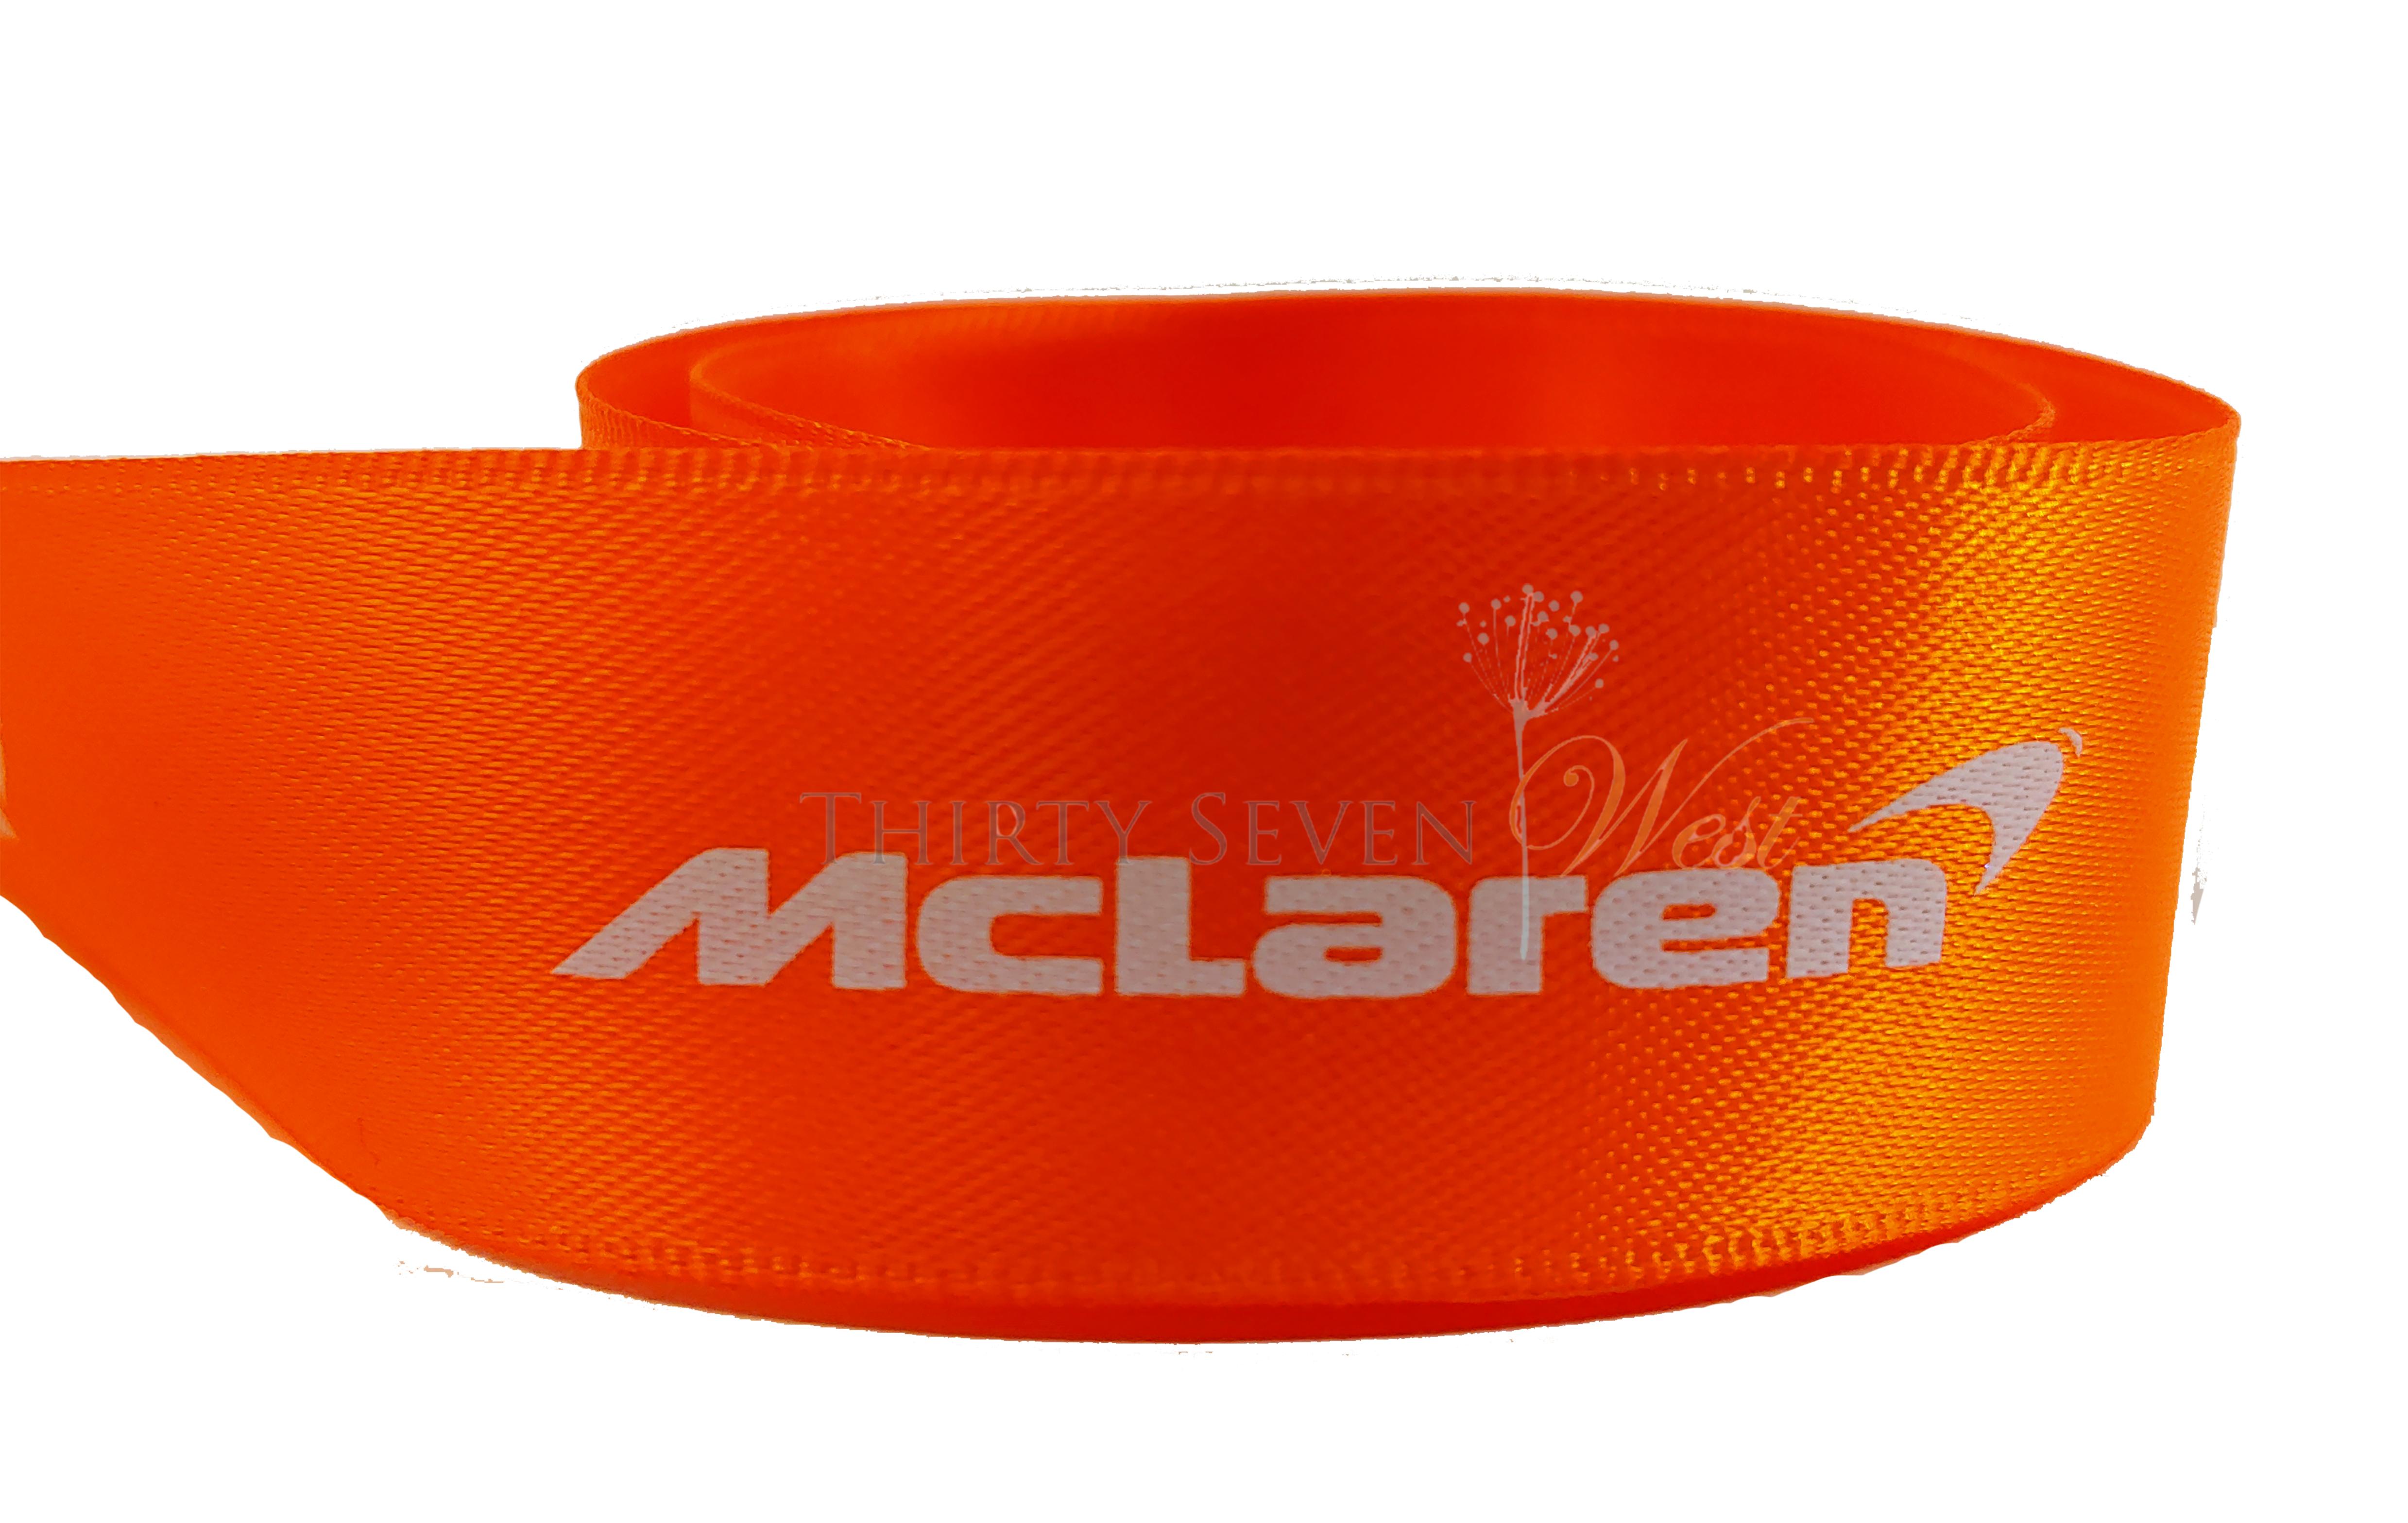 Pantone Color Ribbon, White Print on Ribbon, Logo Ribbon, Company Logo on Ribbon, Satin Logo Ribbon,  Branding Ribbon.